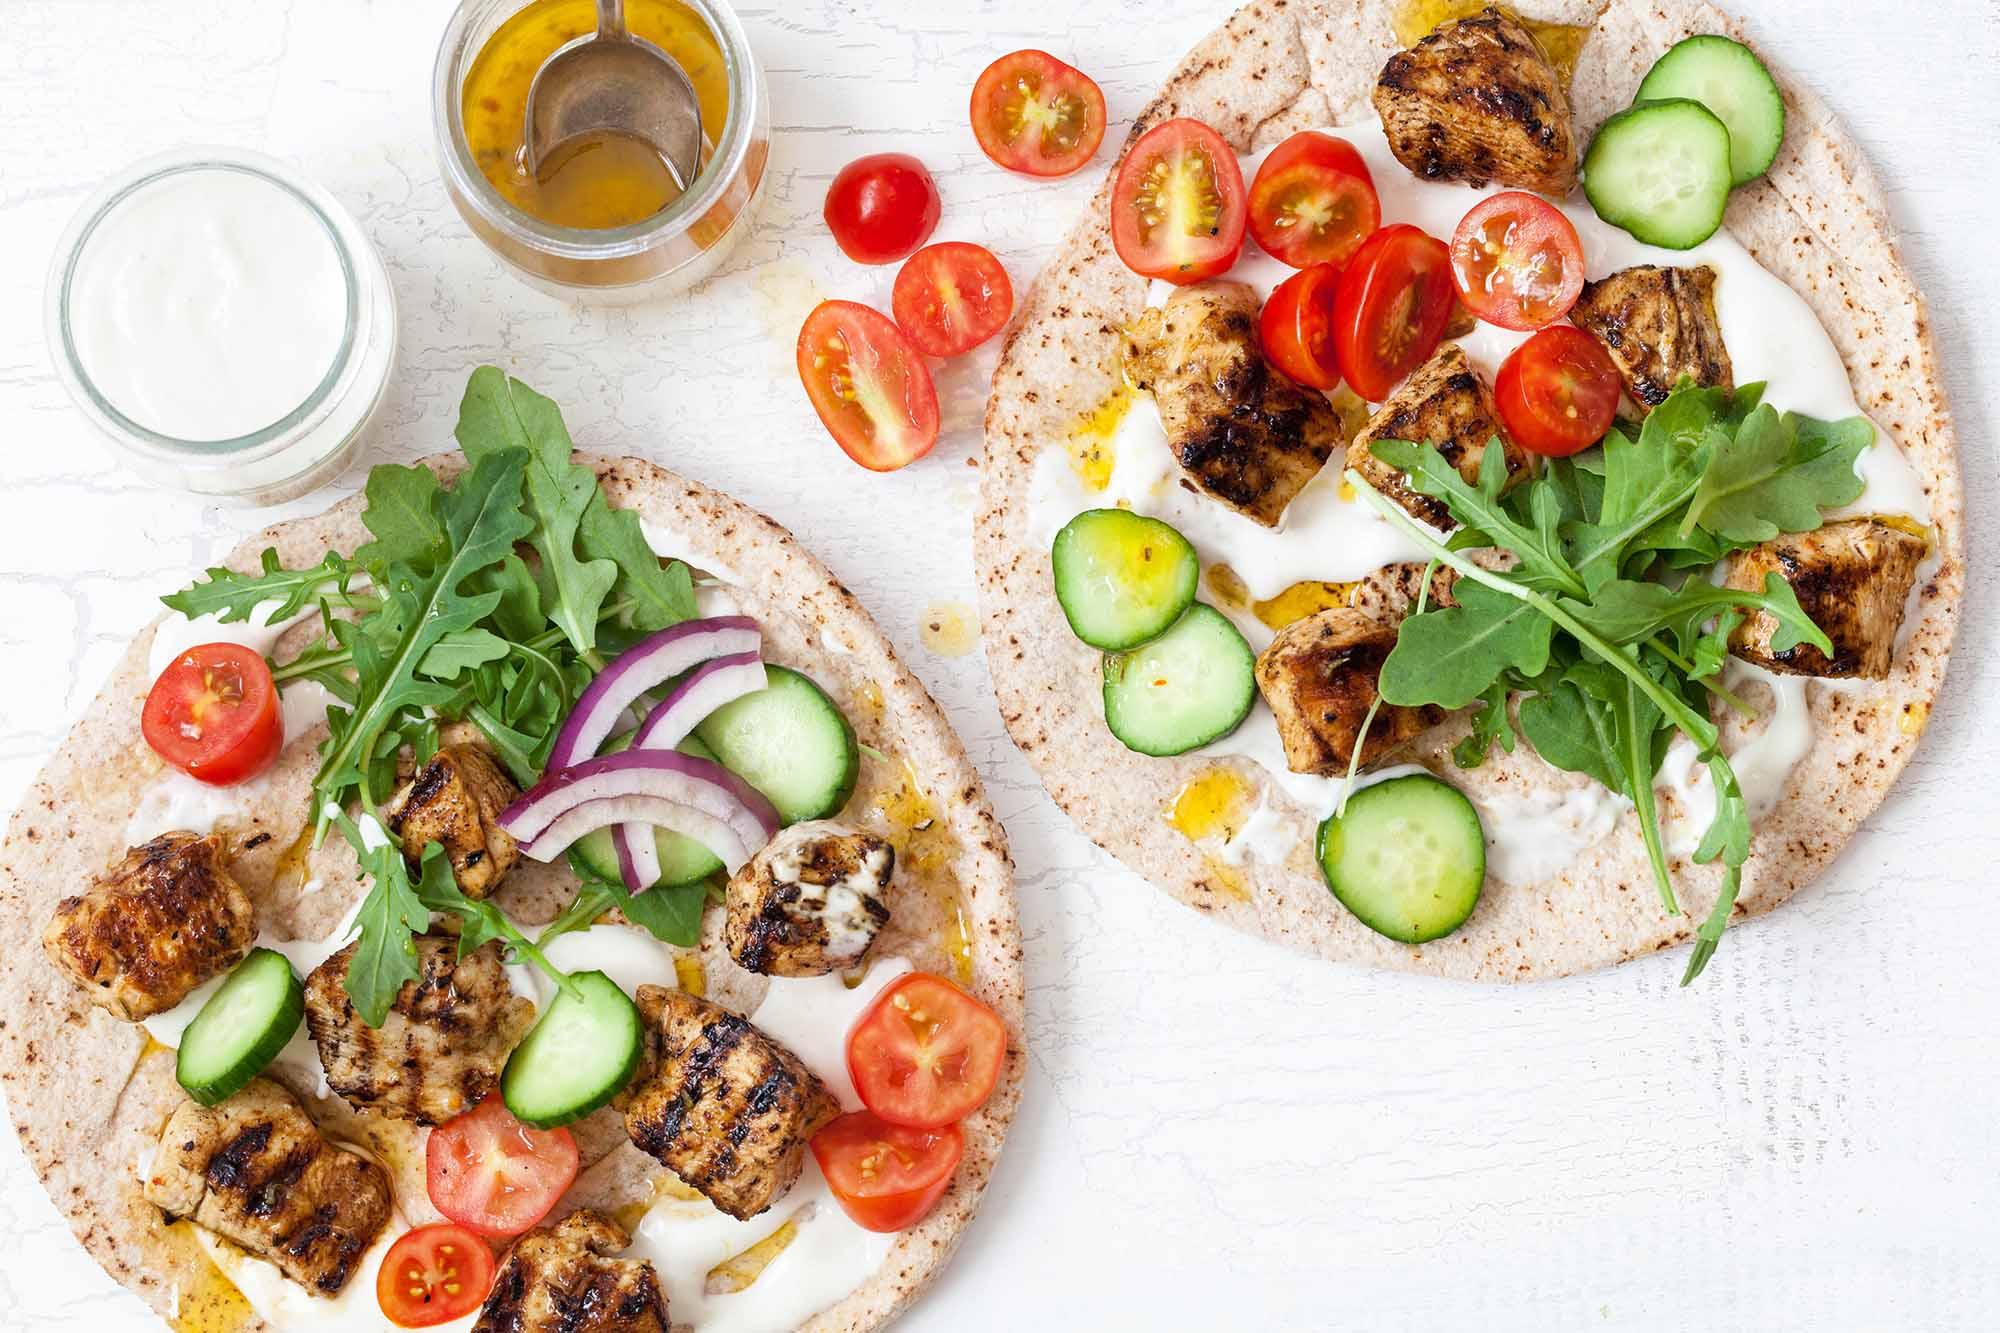 Greek Chicken Skewers with Yogurt Sauce (Chicken Souvlaki) Recipe